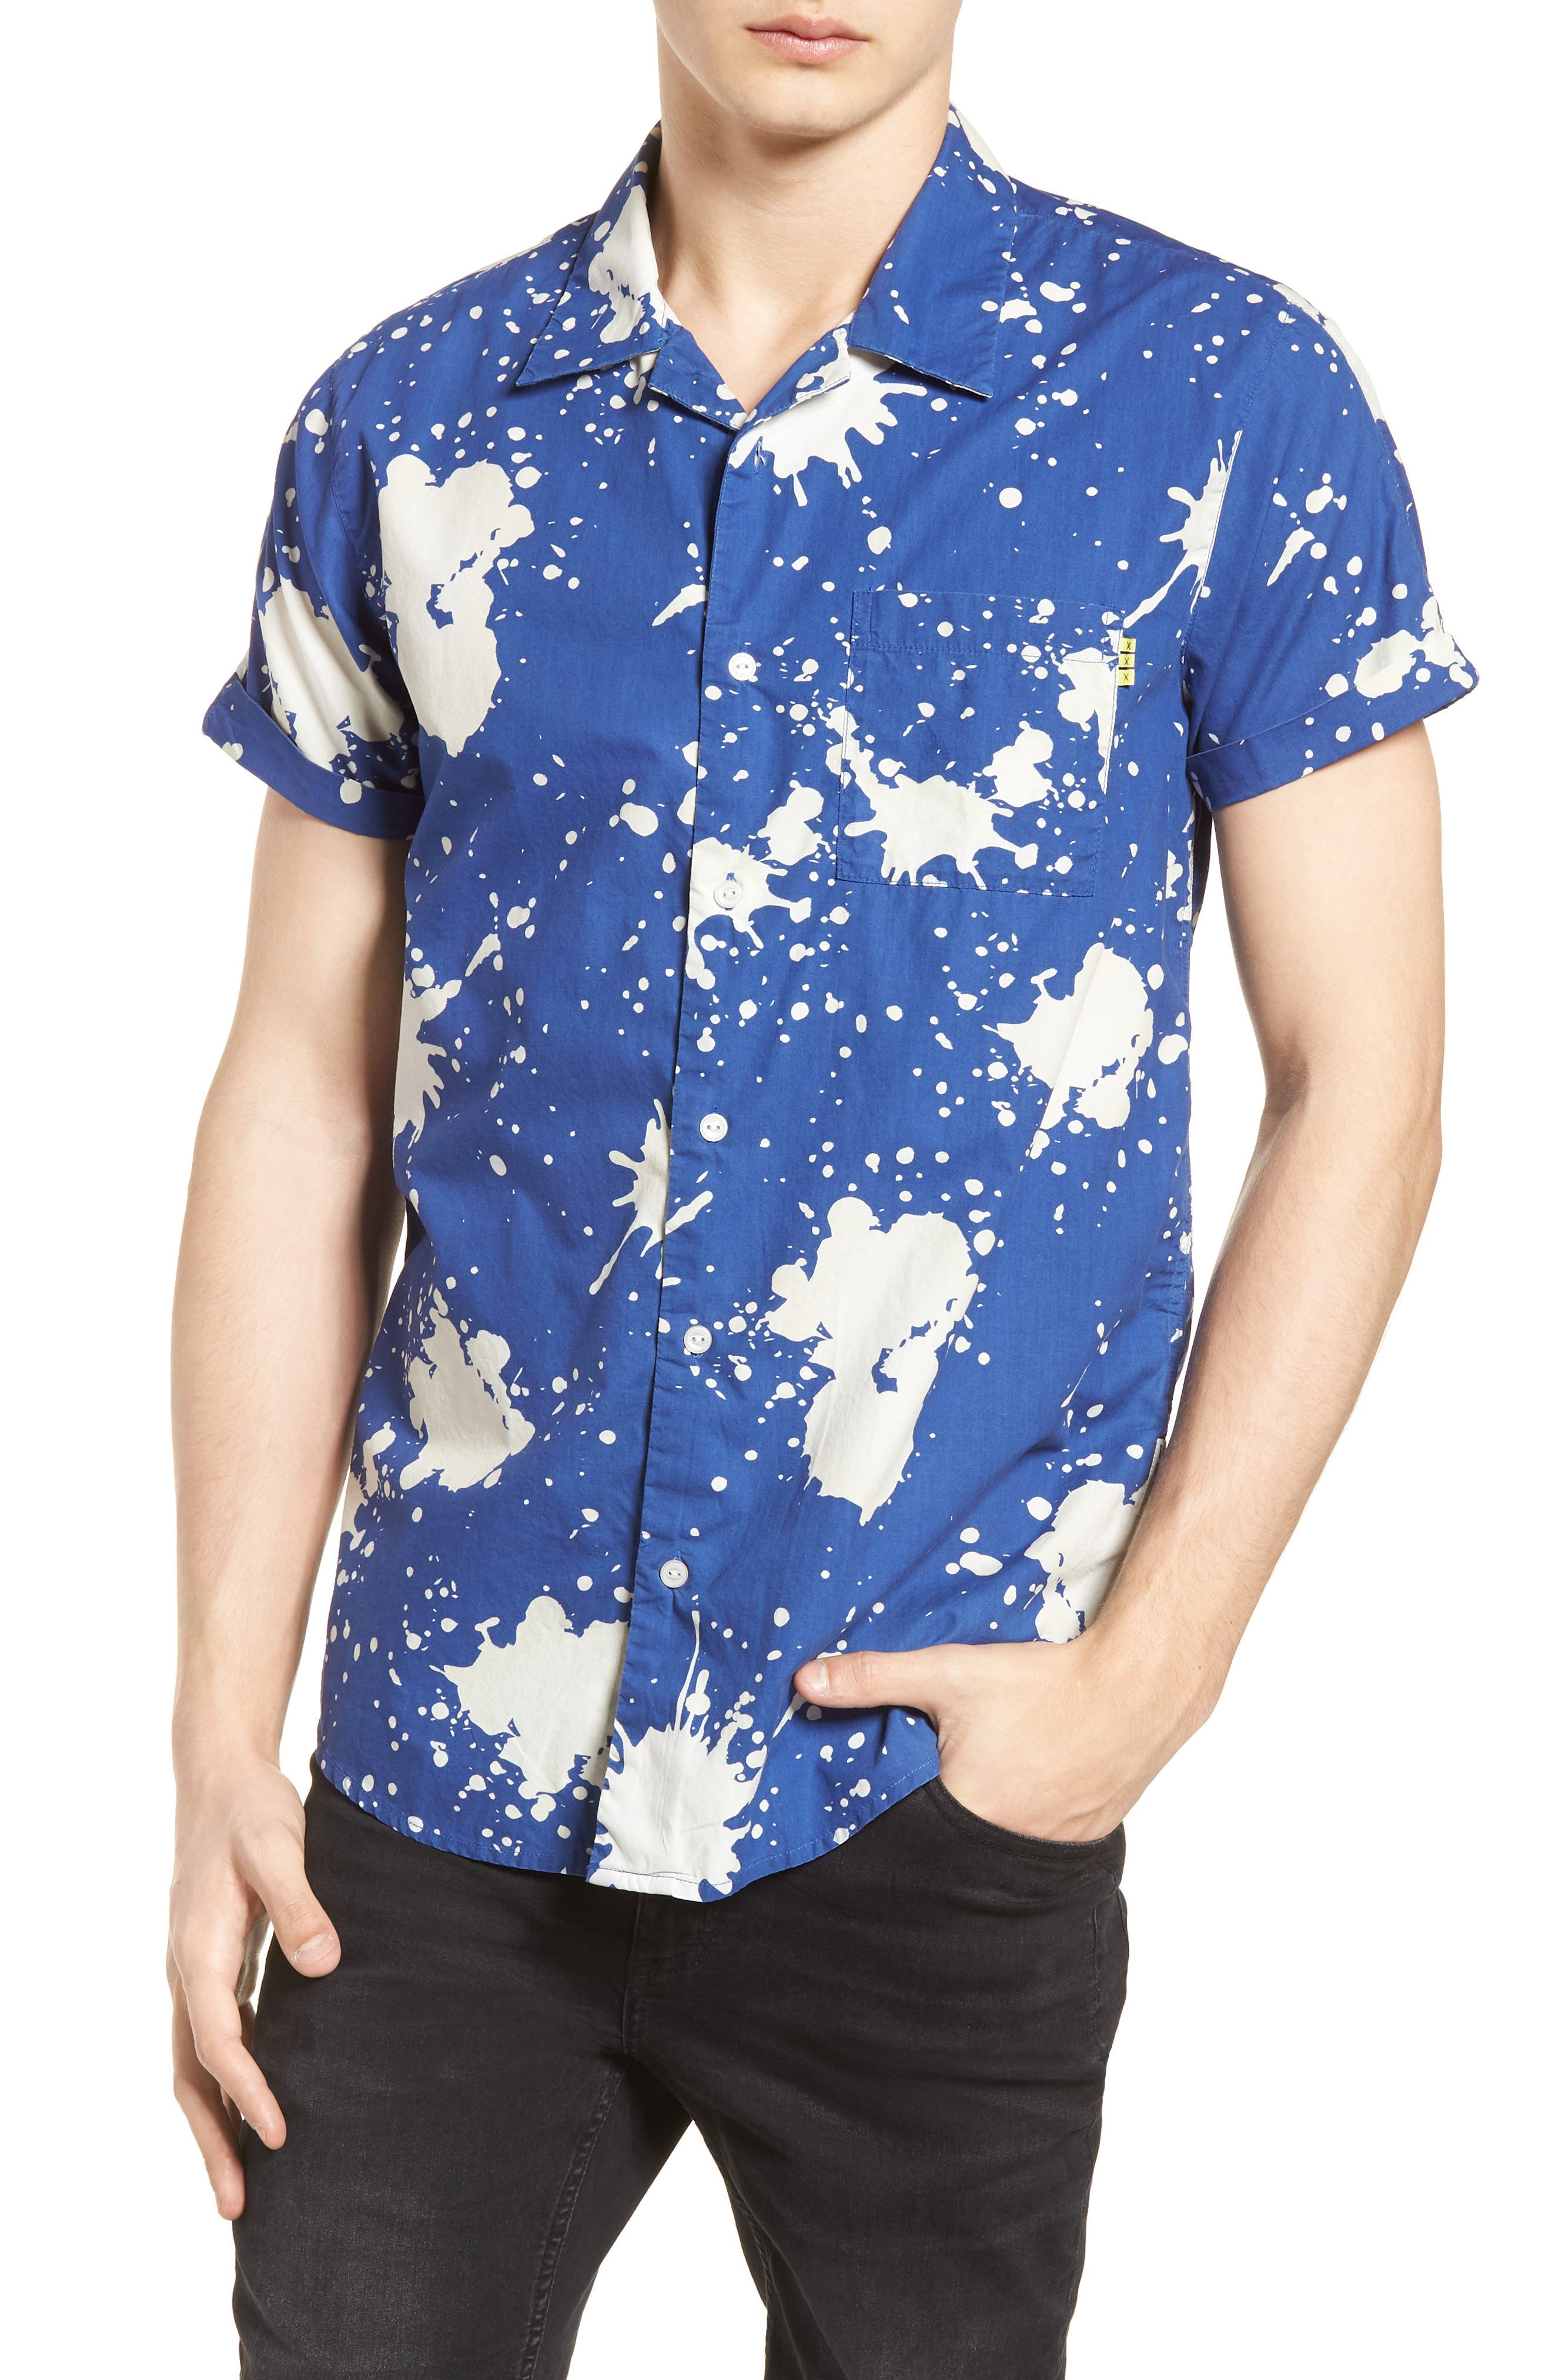 Amsterdams Blauw Allover Print Camp Shirt,                             Main thumbnail 1, color,                             BLUE